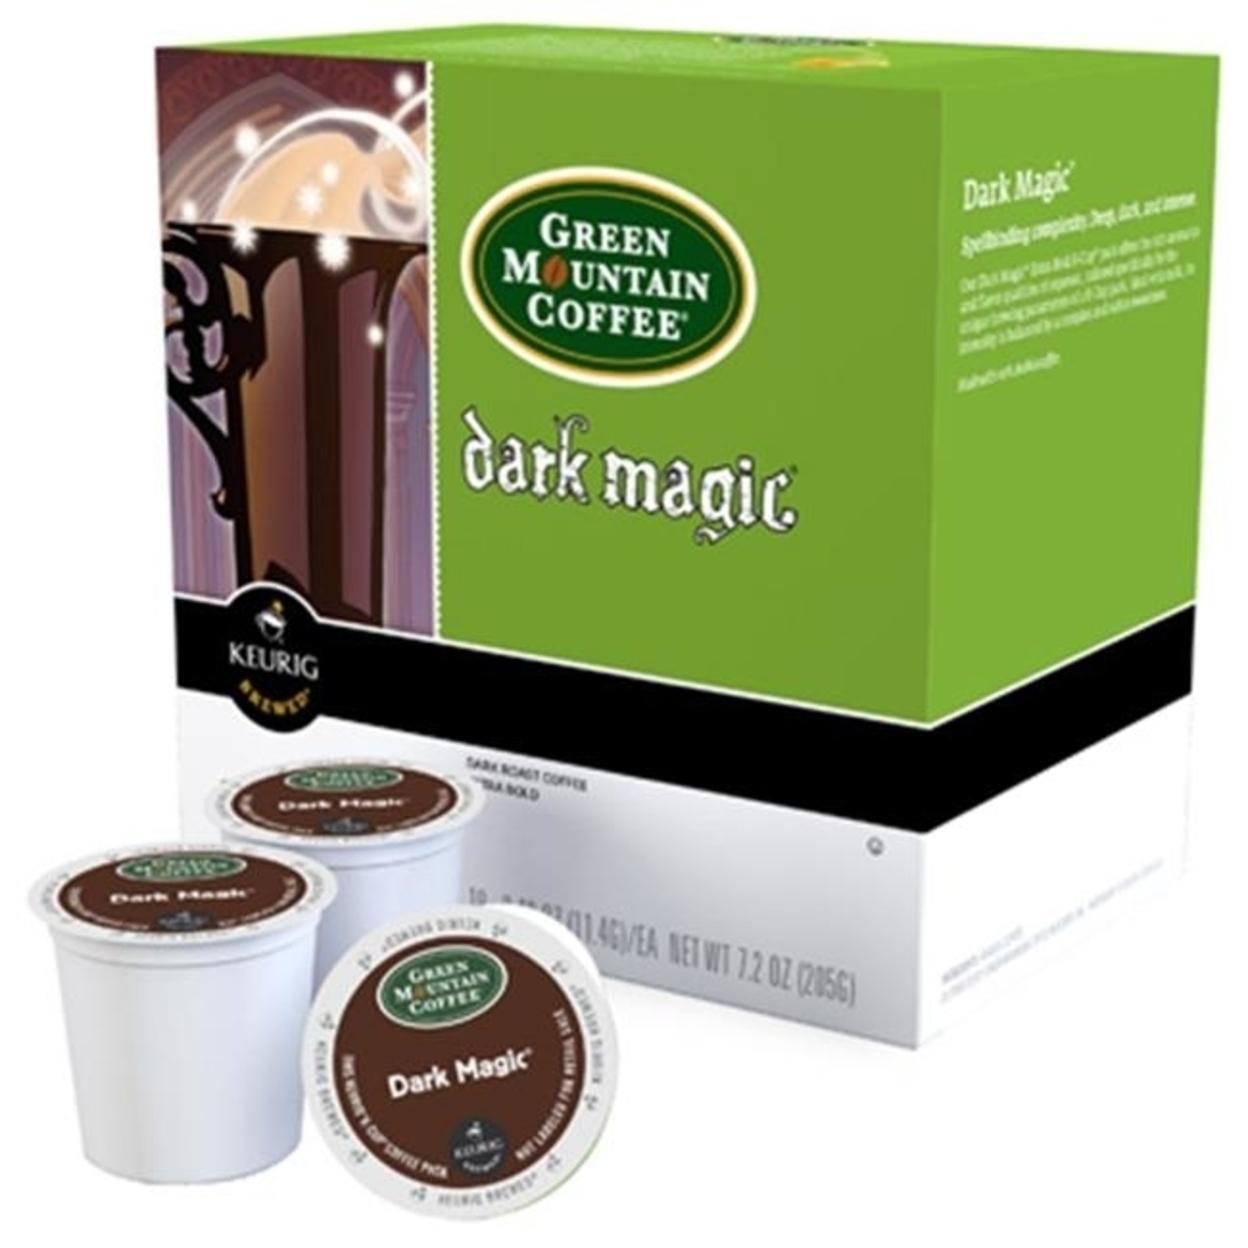 Keurig 108880 Green Mountain Dark Magic Extra Bold Single Serve K-Cup 18 Count 5a3d229fe22461781a644a21